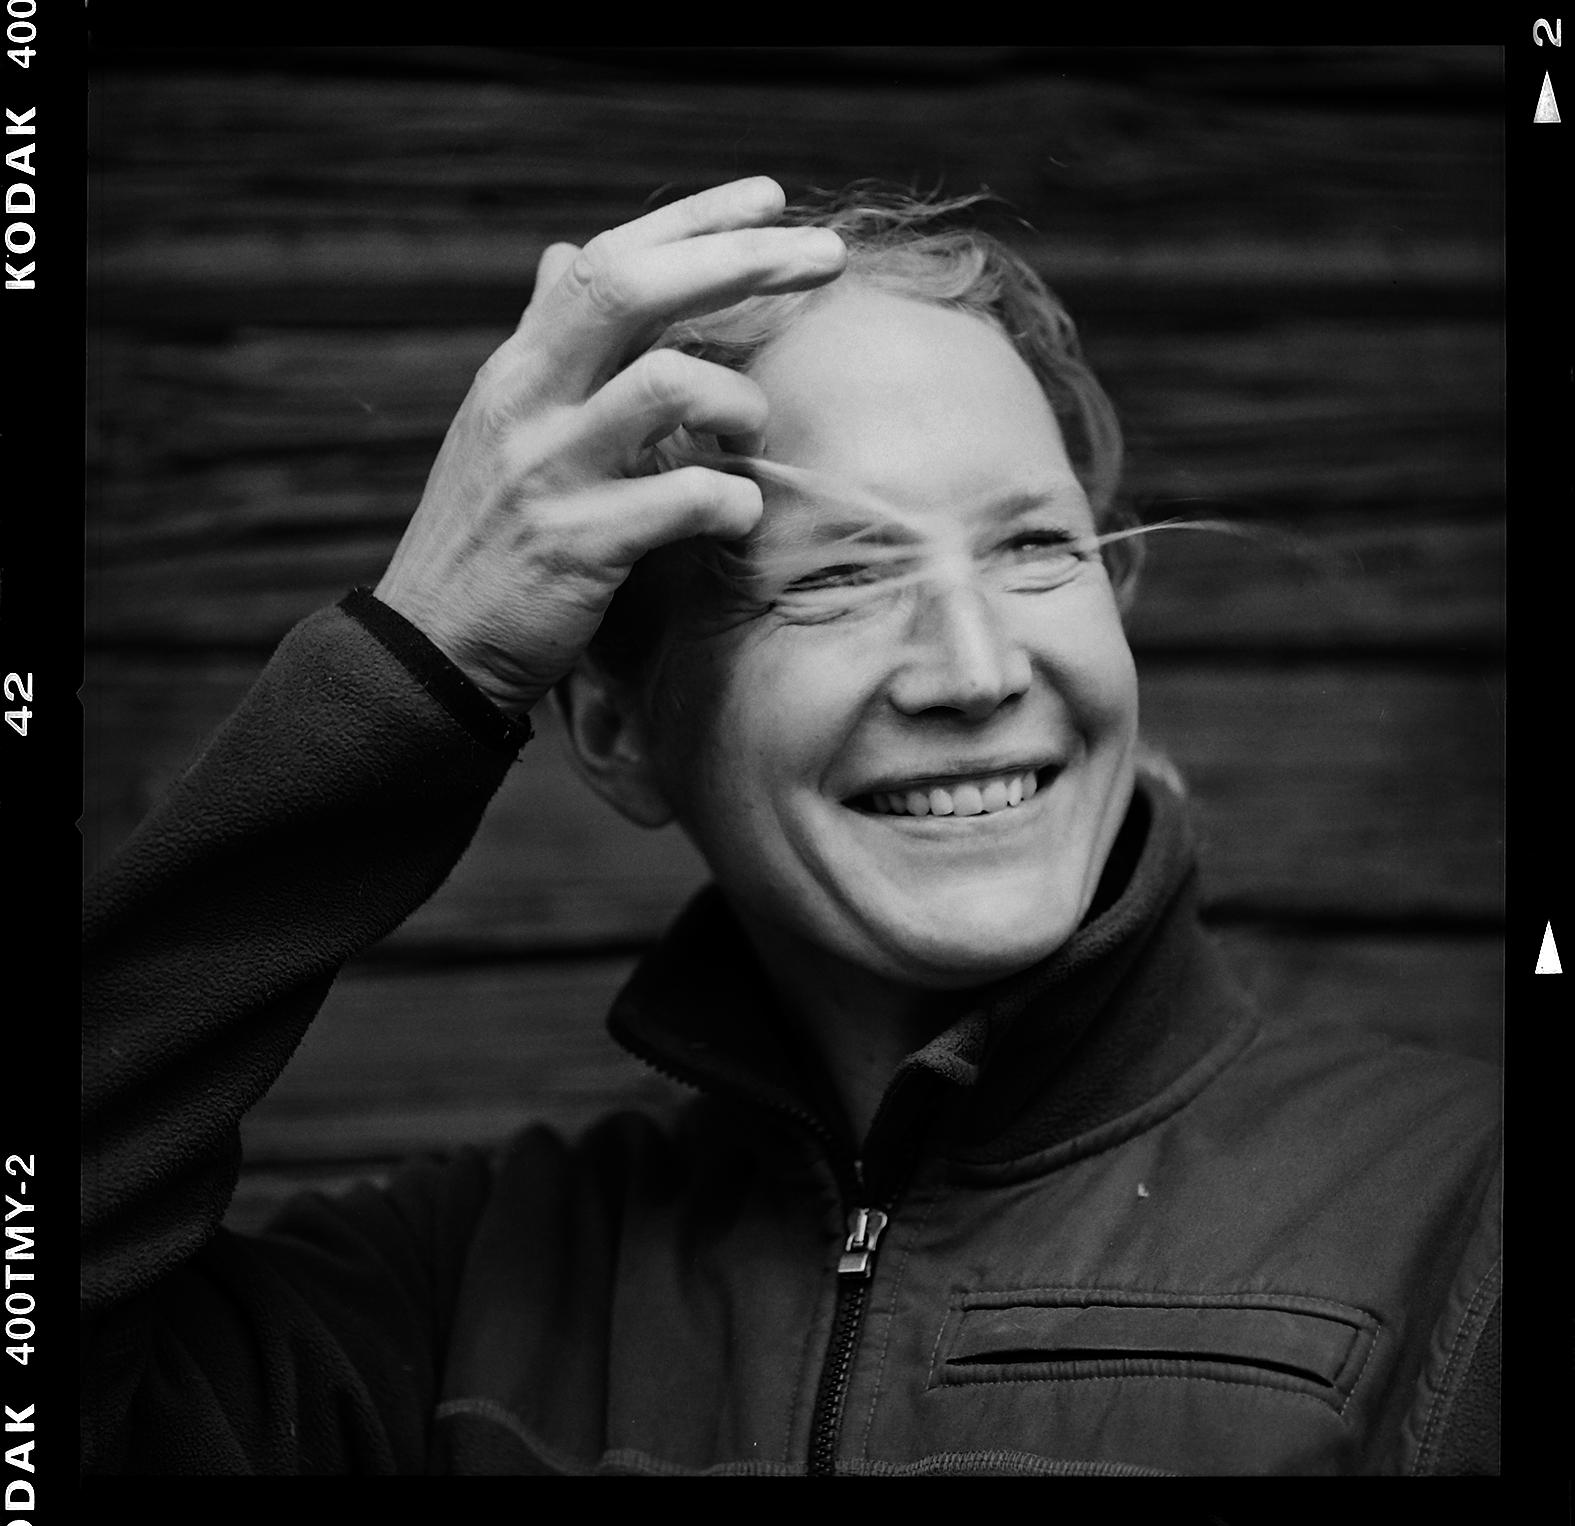 Sofia Nilsson. Foto: Mikael Andersson, 2016-05-18, Hasselblad 500 cm, 150 mm, f4-1/250 sek,